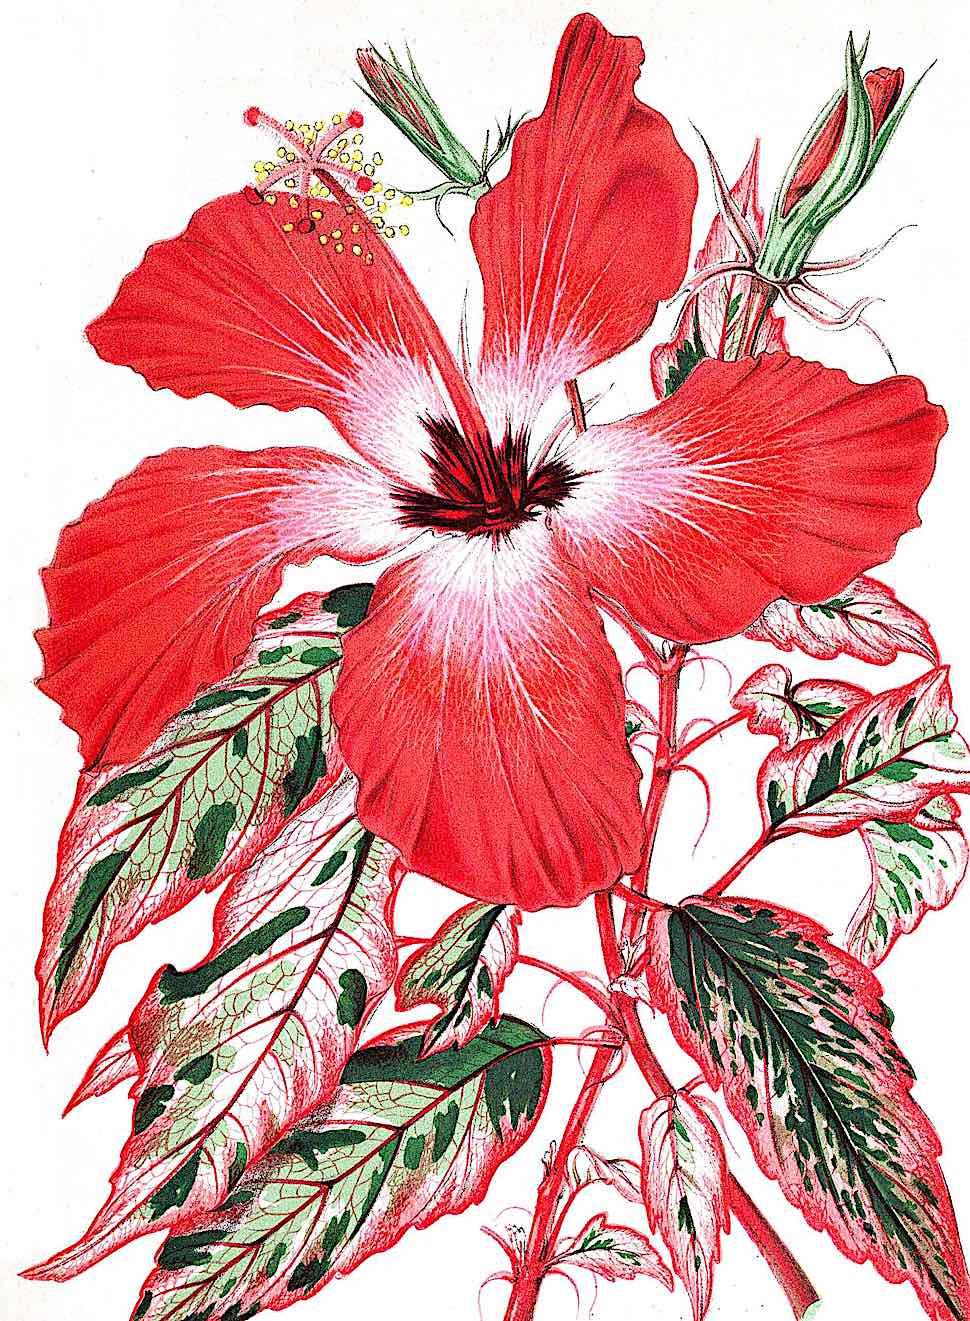 an 1863 botanical illustration of a red flower